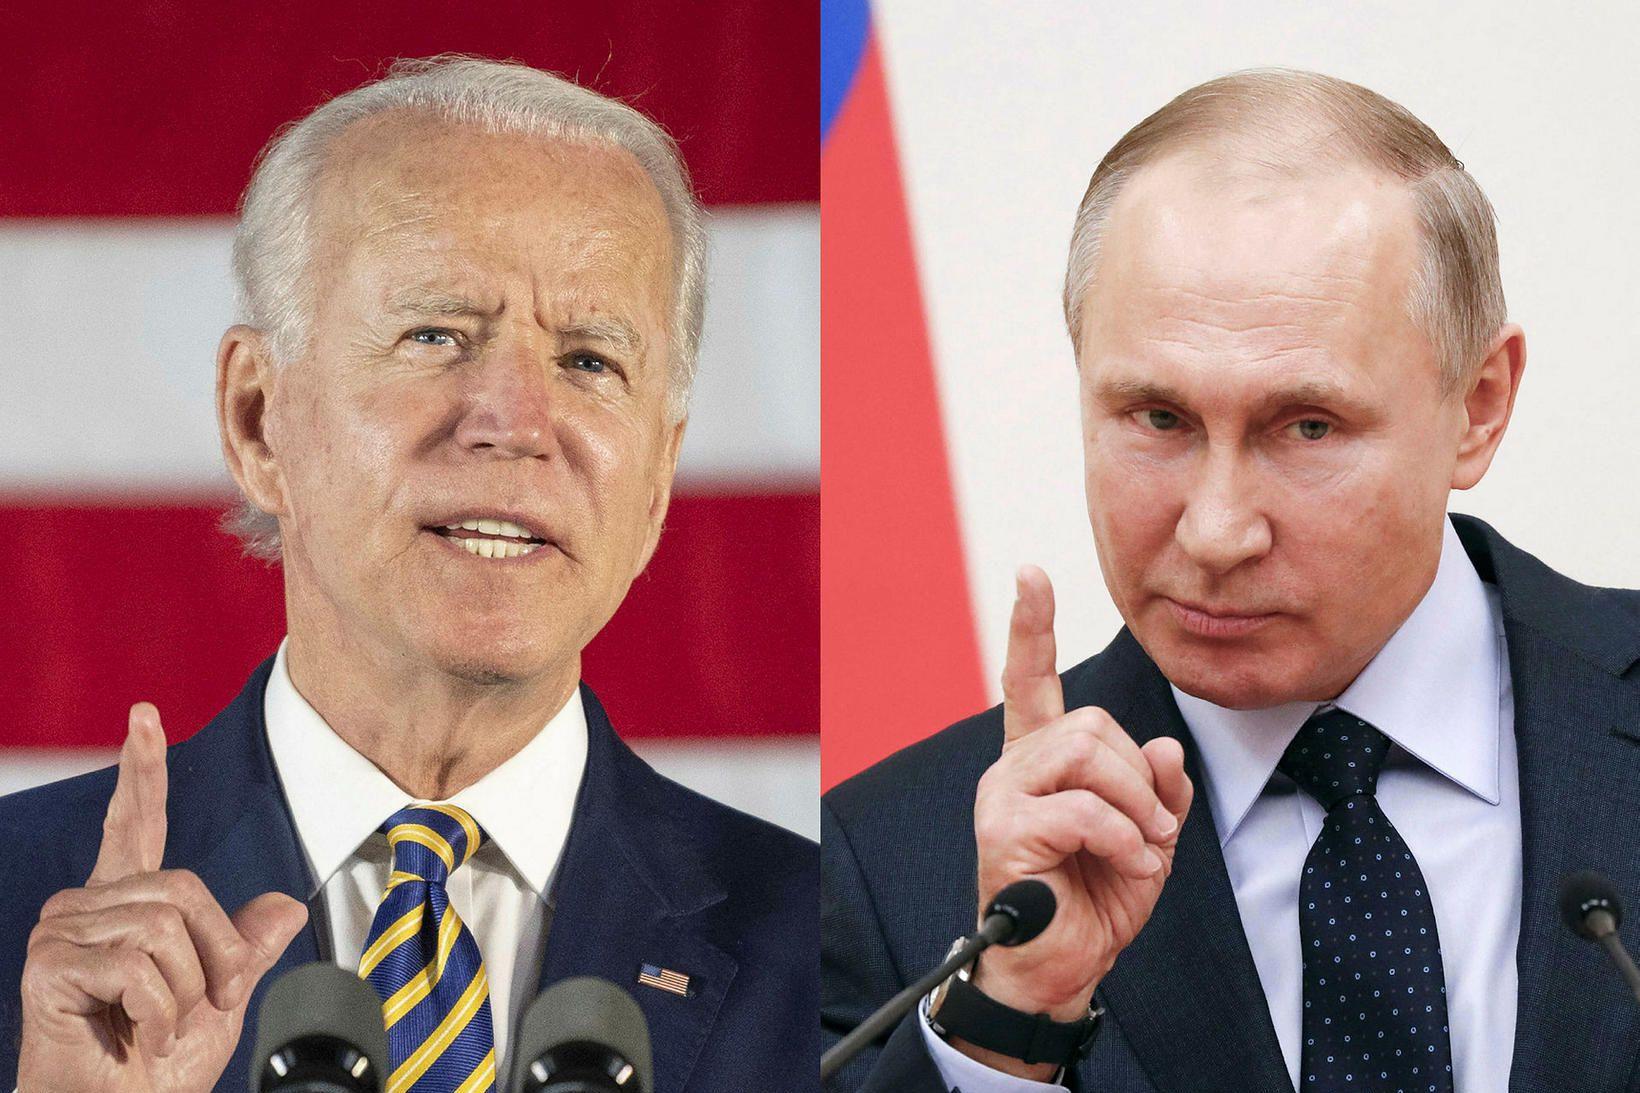 Joe Biden forseti Bandaríkjanna og Vladimír Pútín forseti Rússlands ætla …